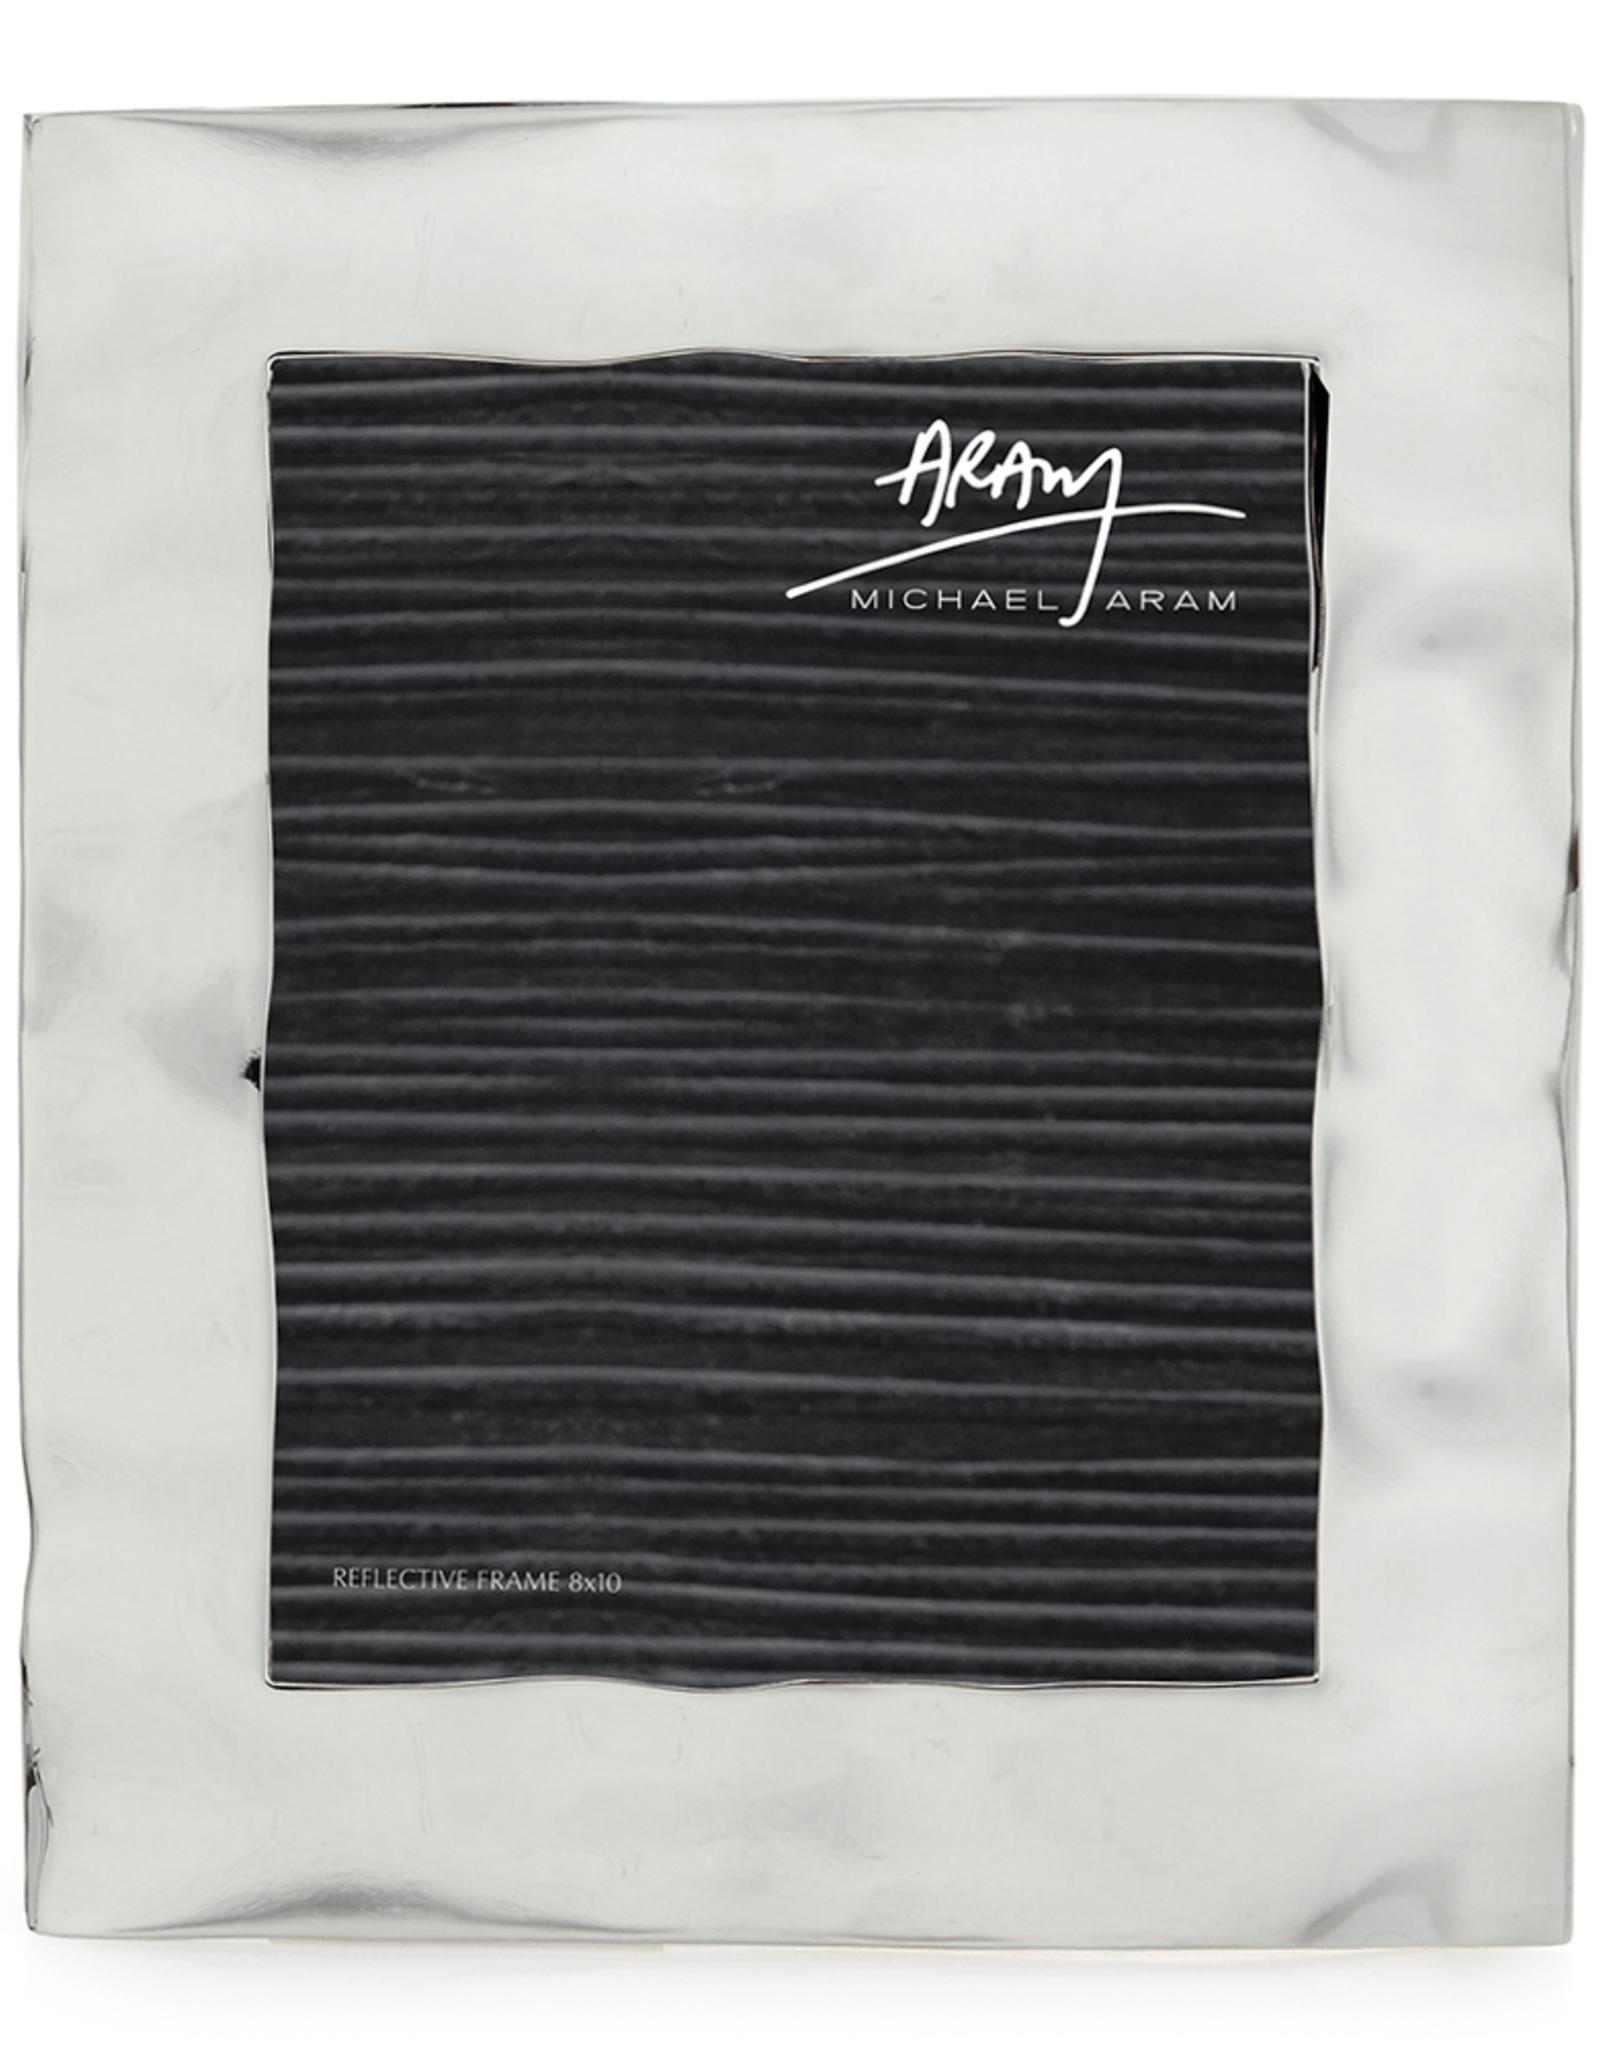 Michael Aram Reflective Frame - 8x10